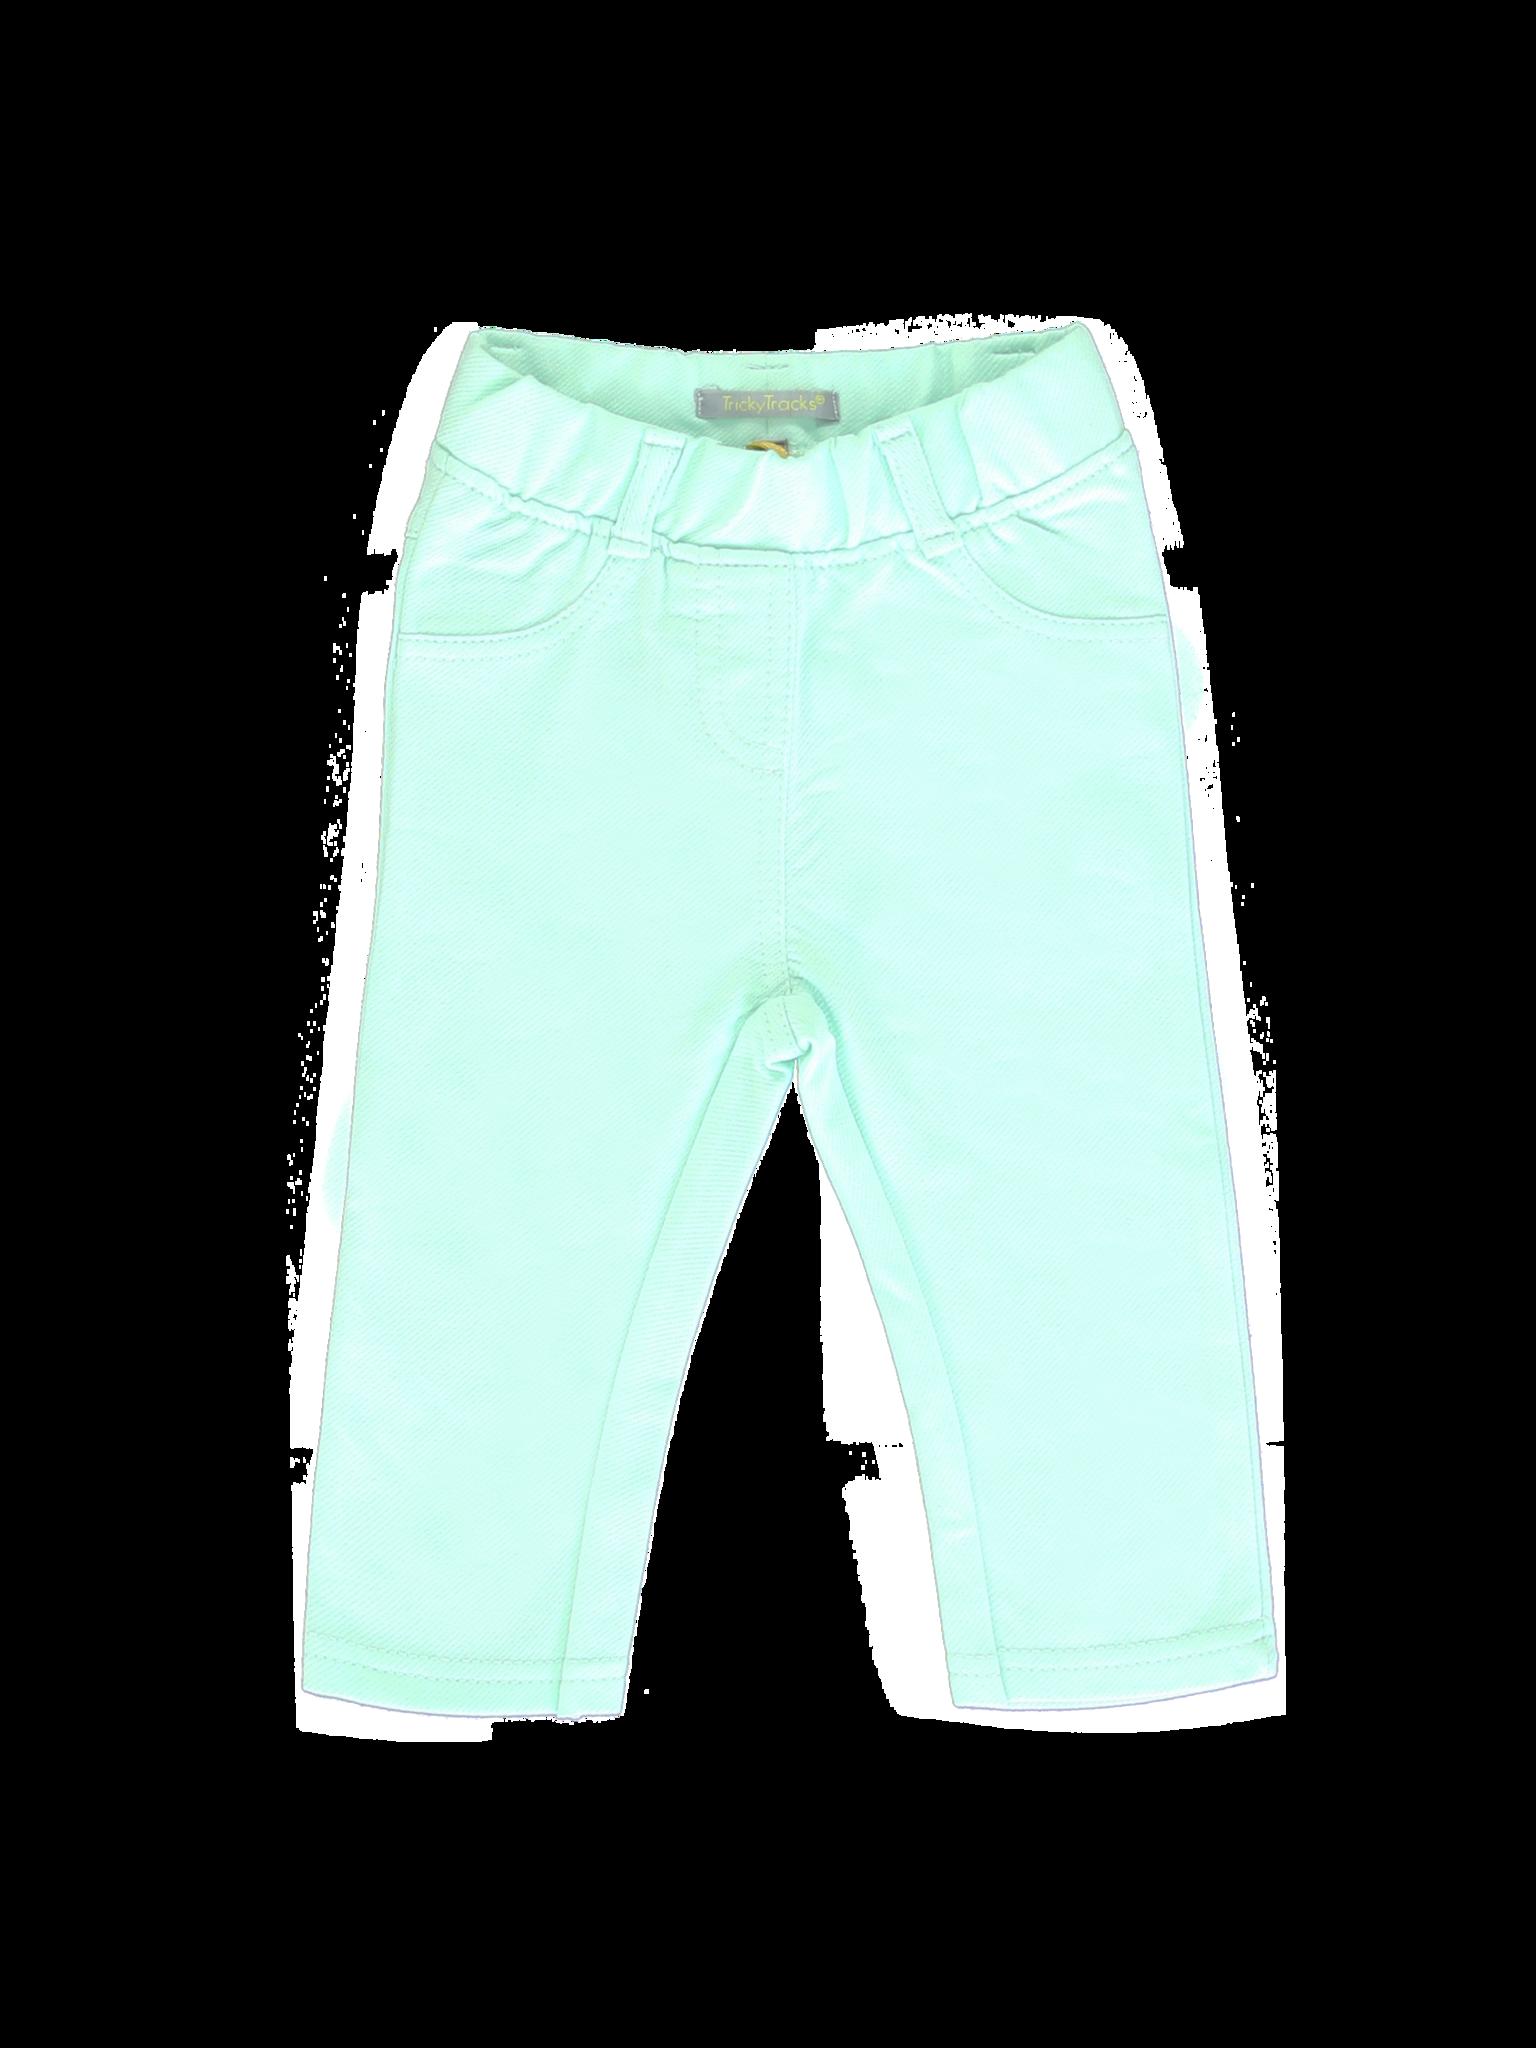 All Brands | Summerproducts Baby | Pants | 16 pcs/box